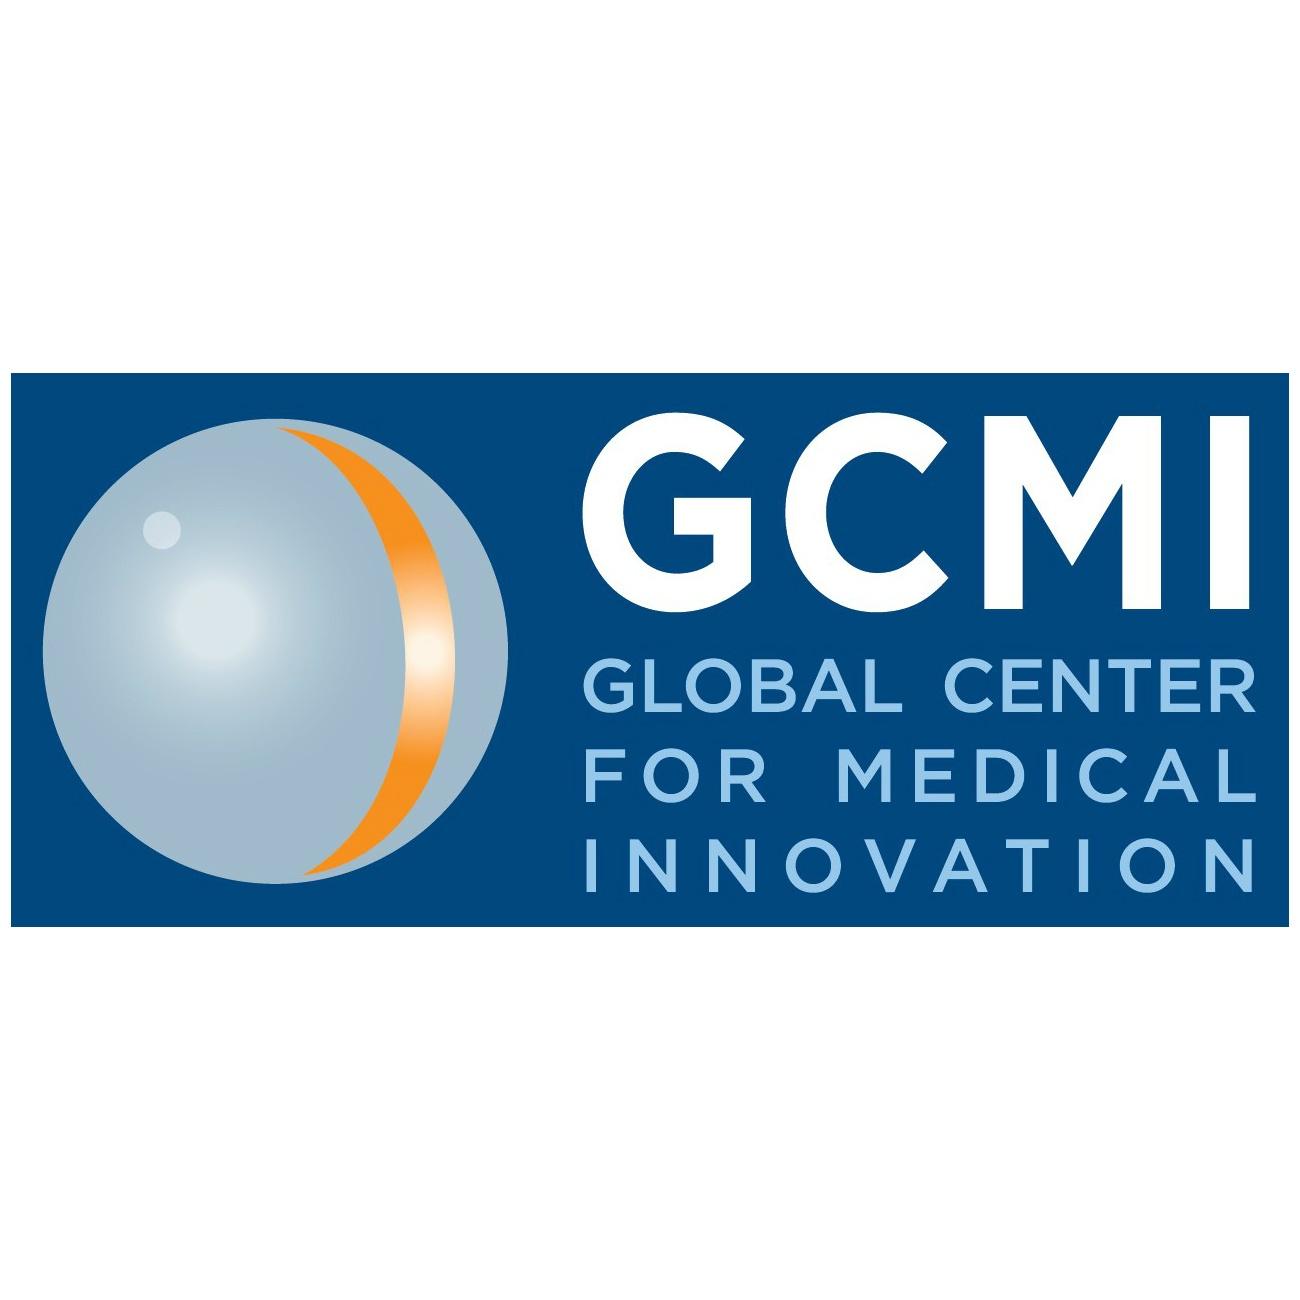 GCMI (Global Center for Medical Innovation)